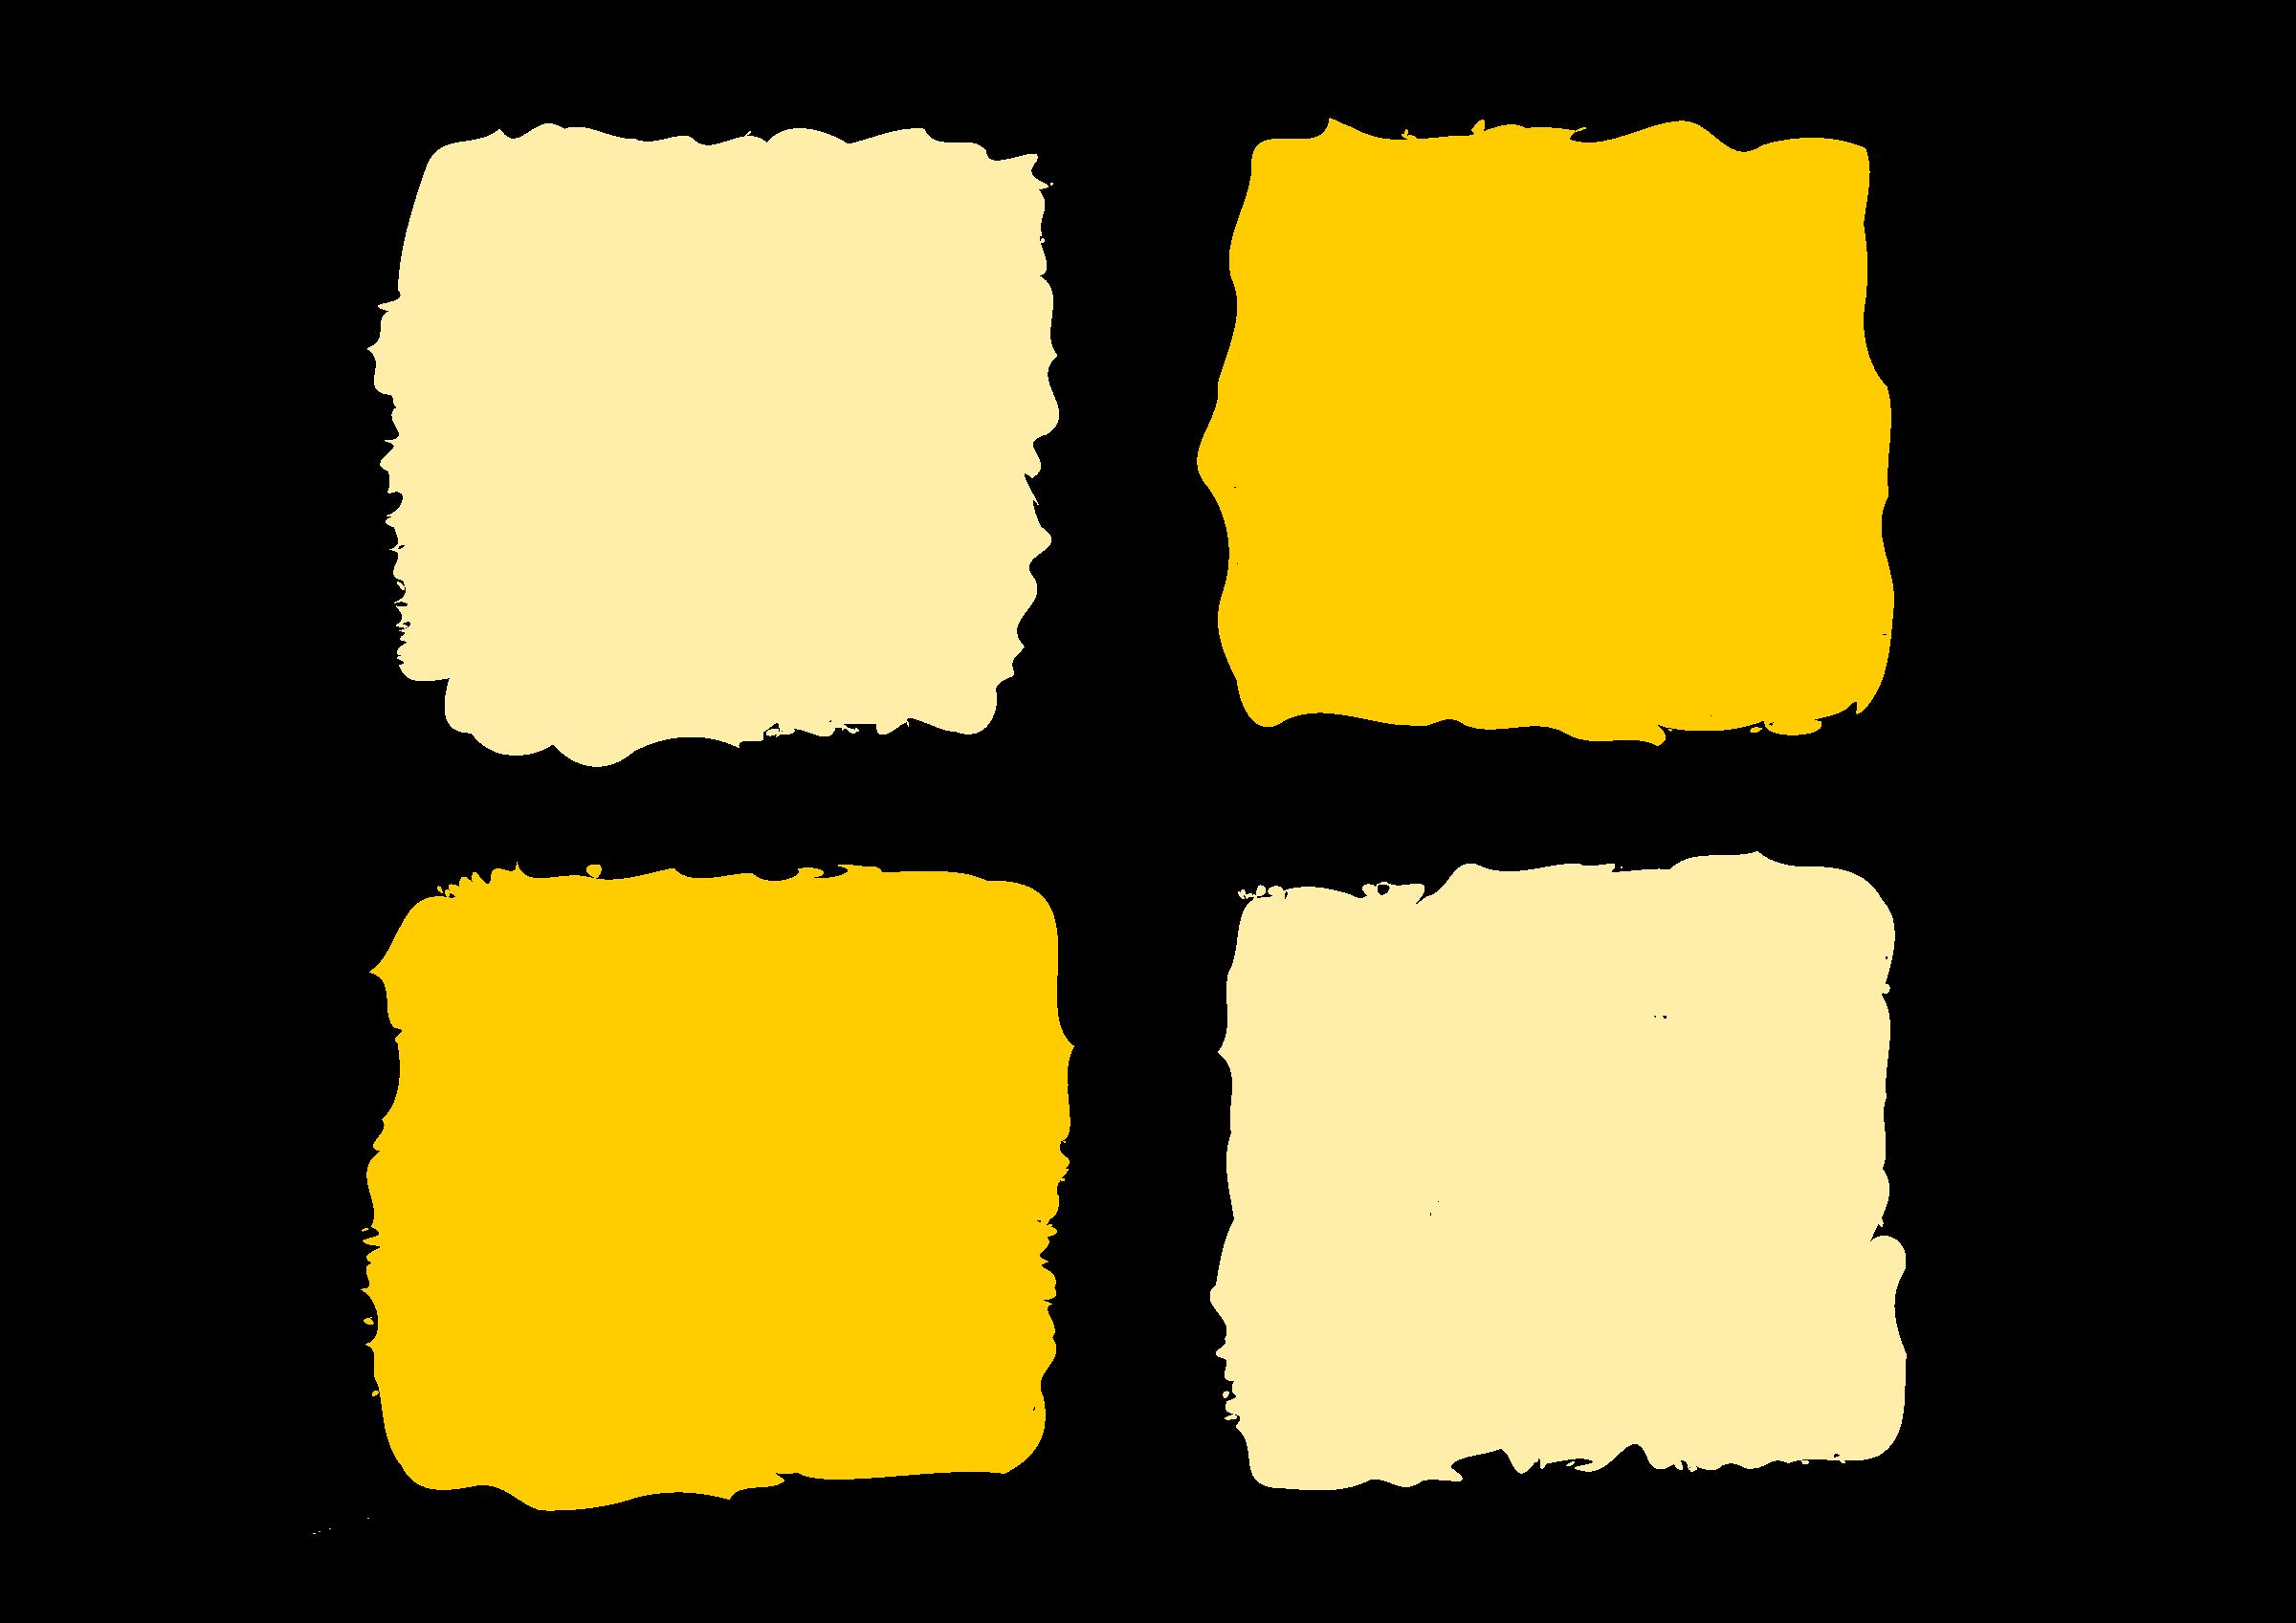 Square clipart yello. Yellow squares big image